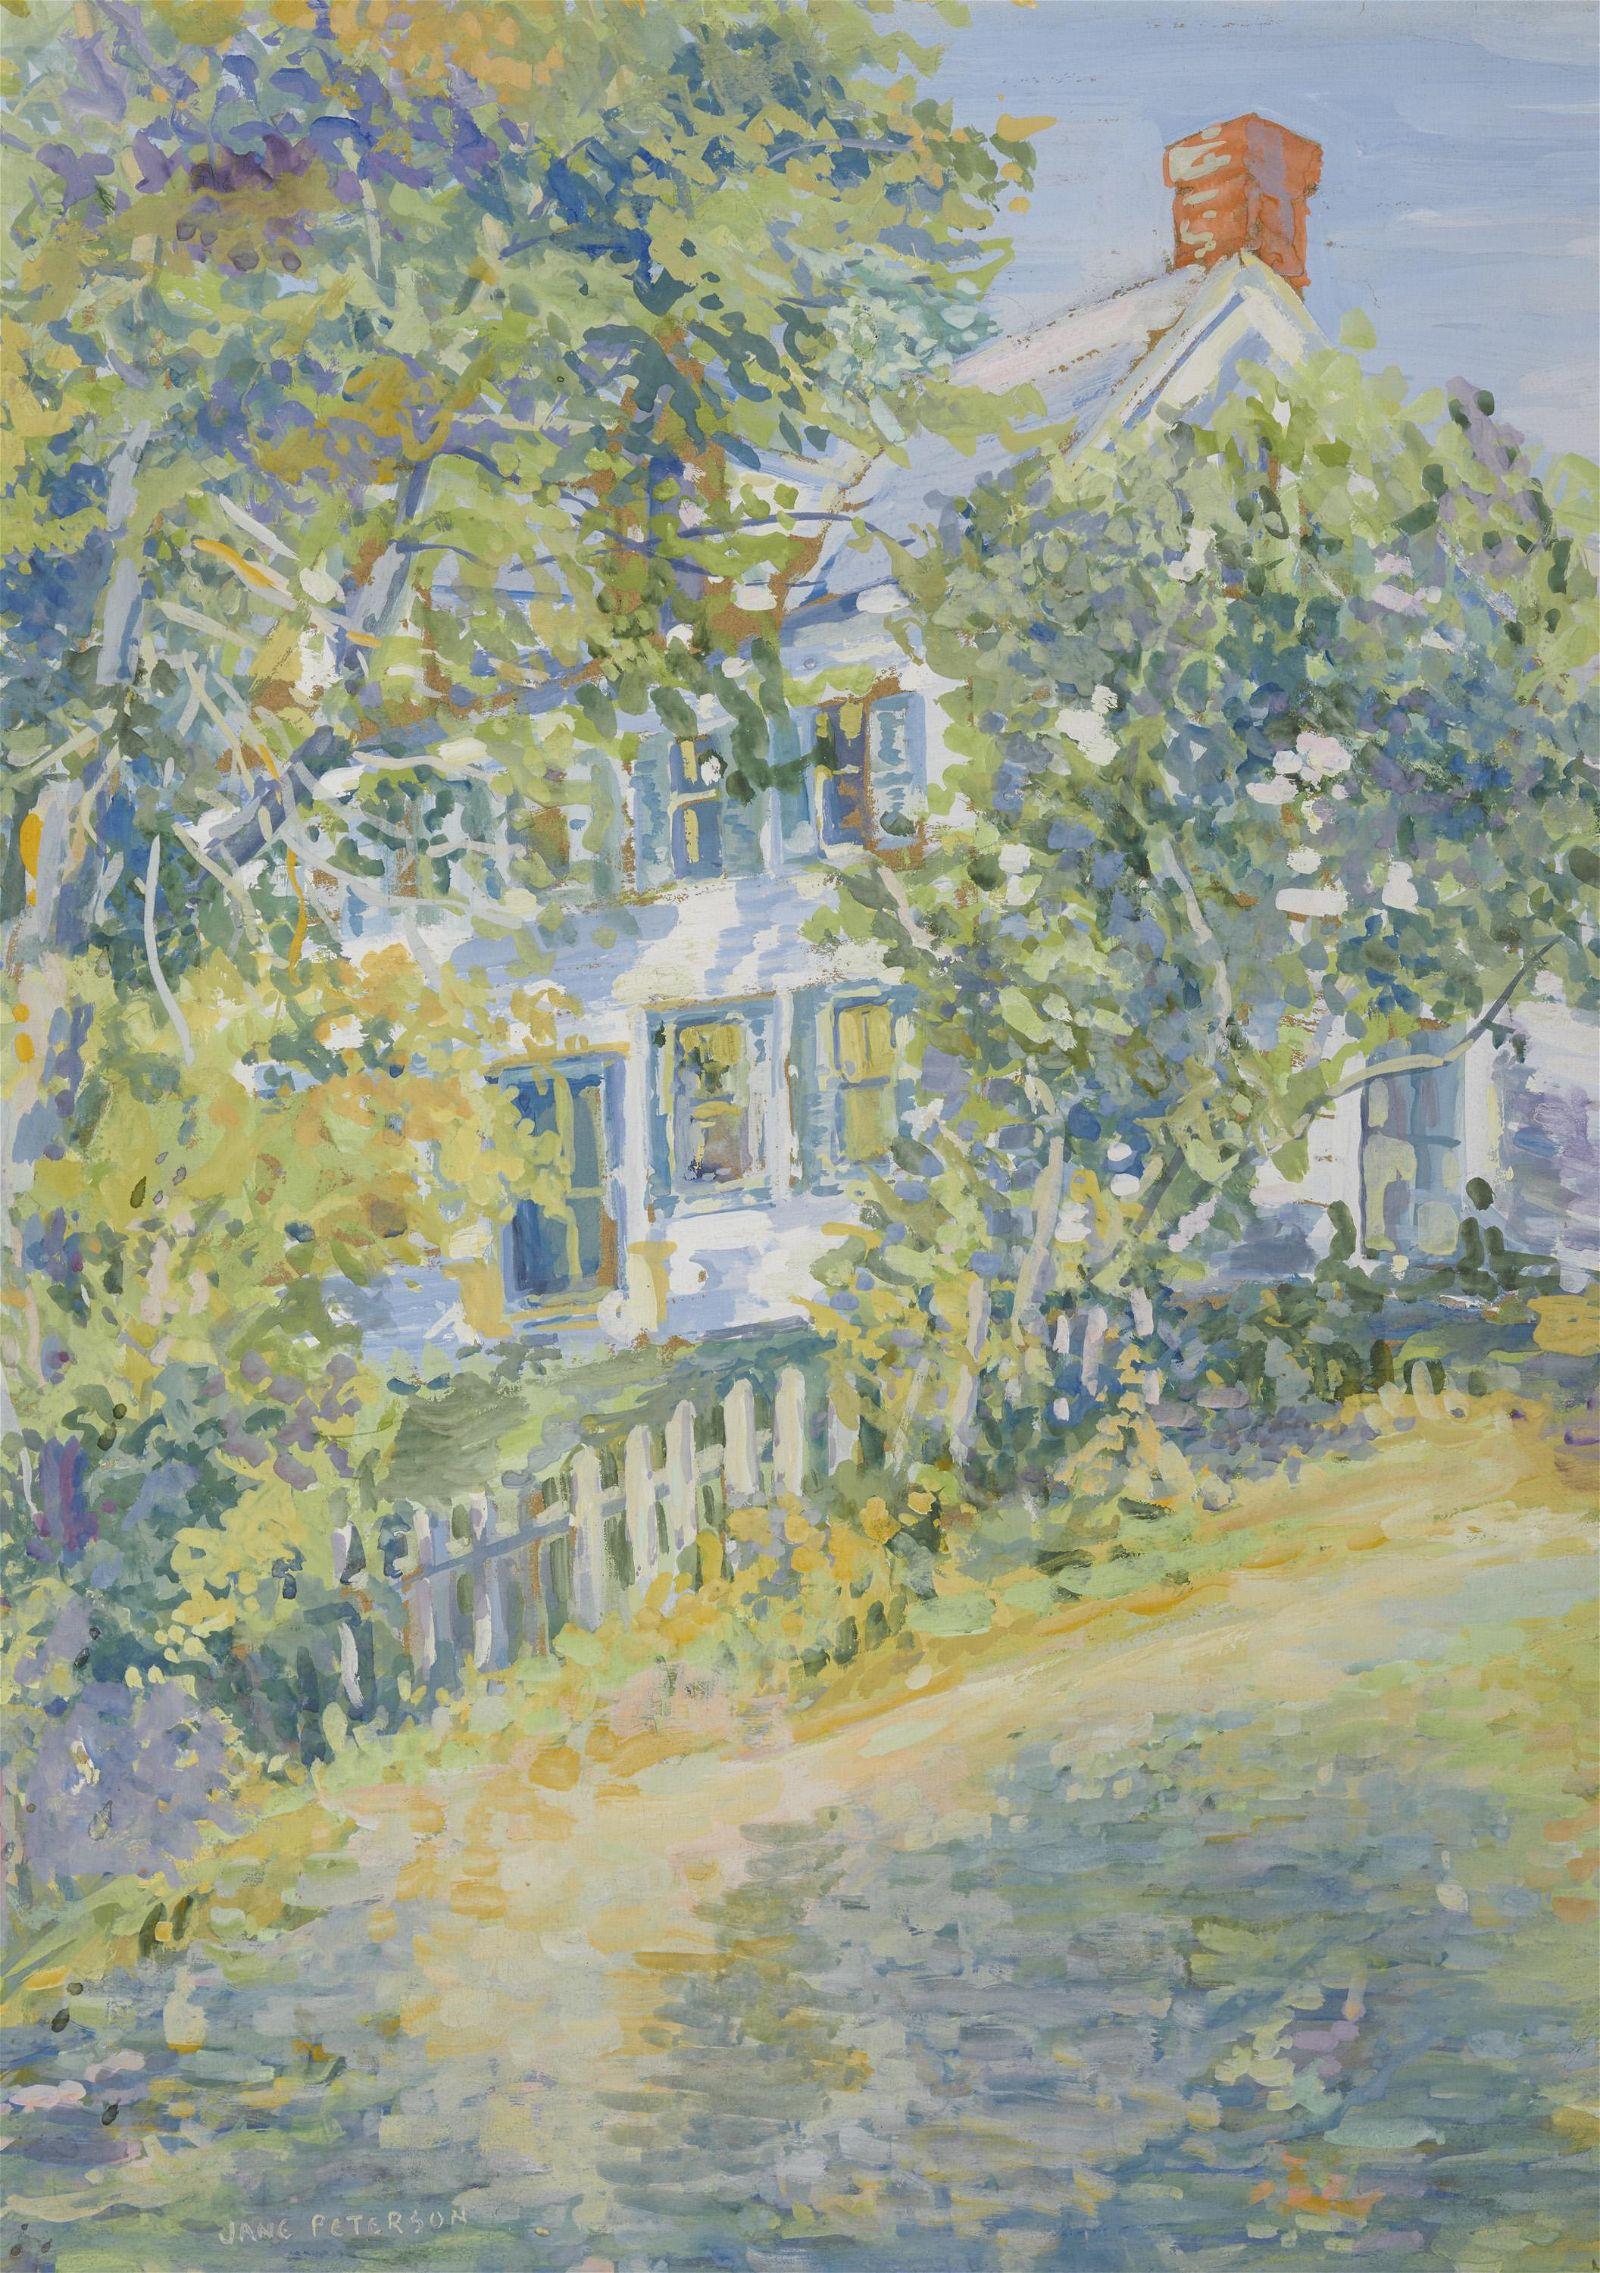 JANE PETERSON, (American, 1876-1965), White House,